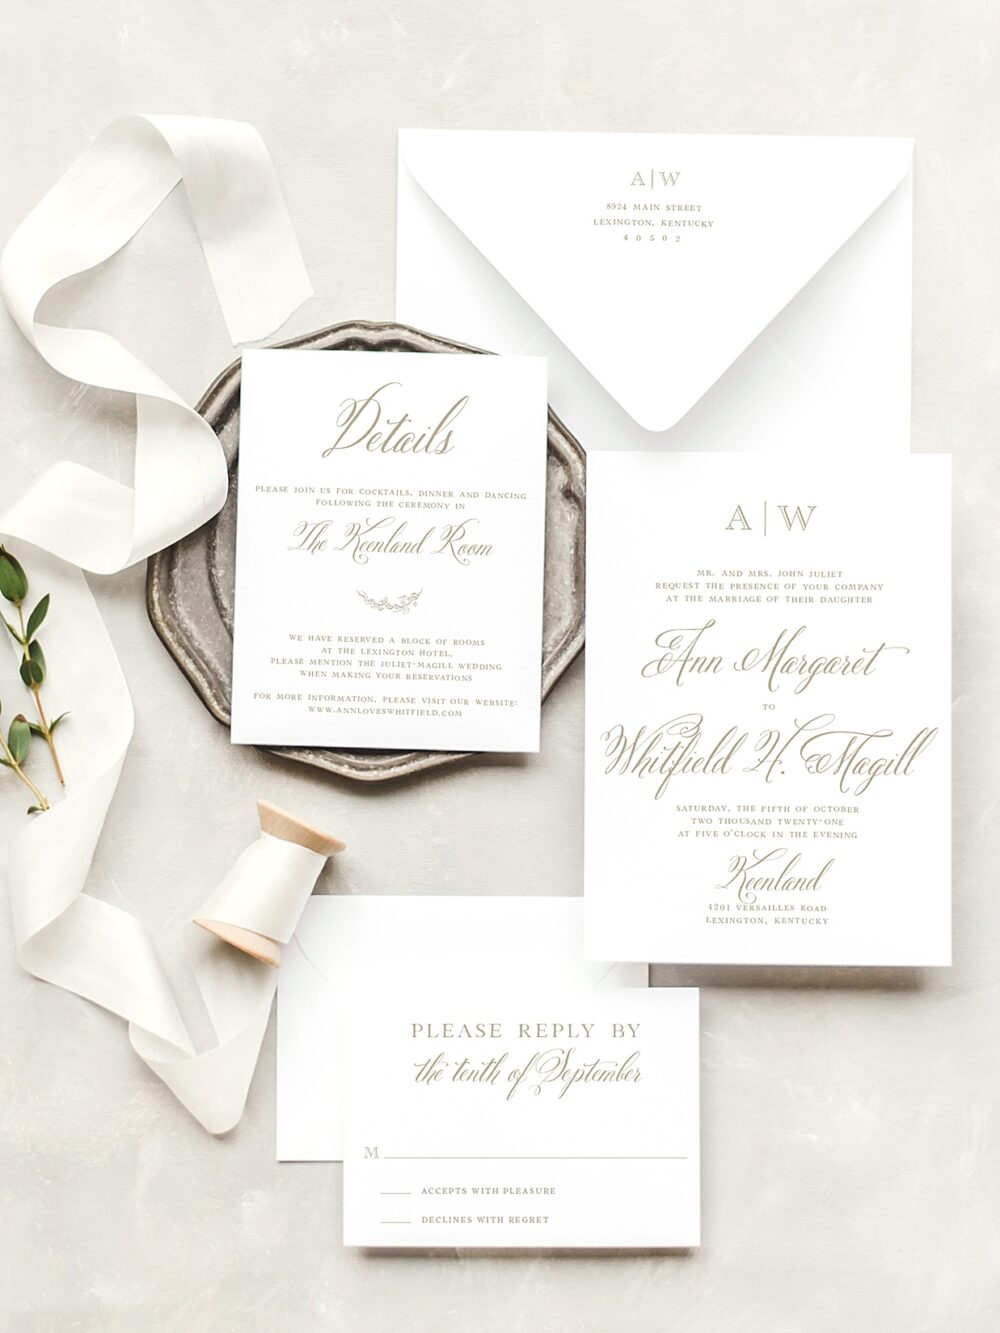 James Classic Monogram Wedding Invitation